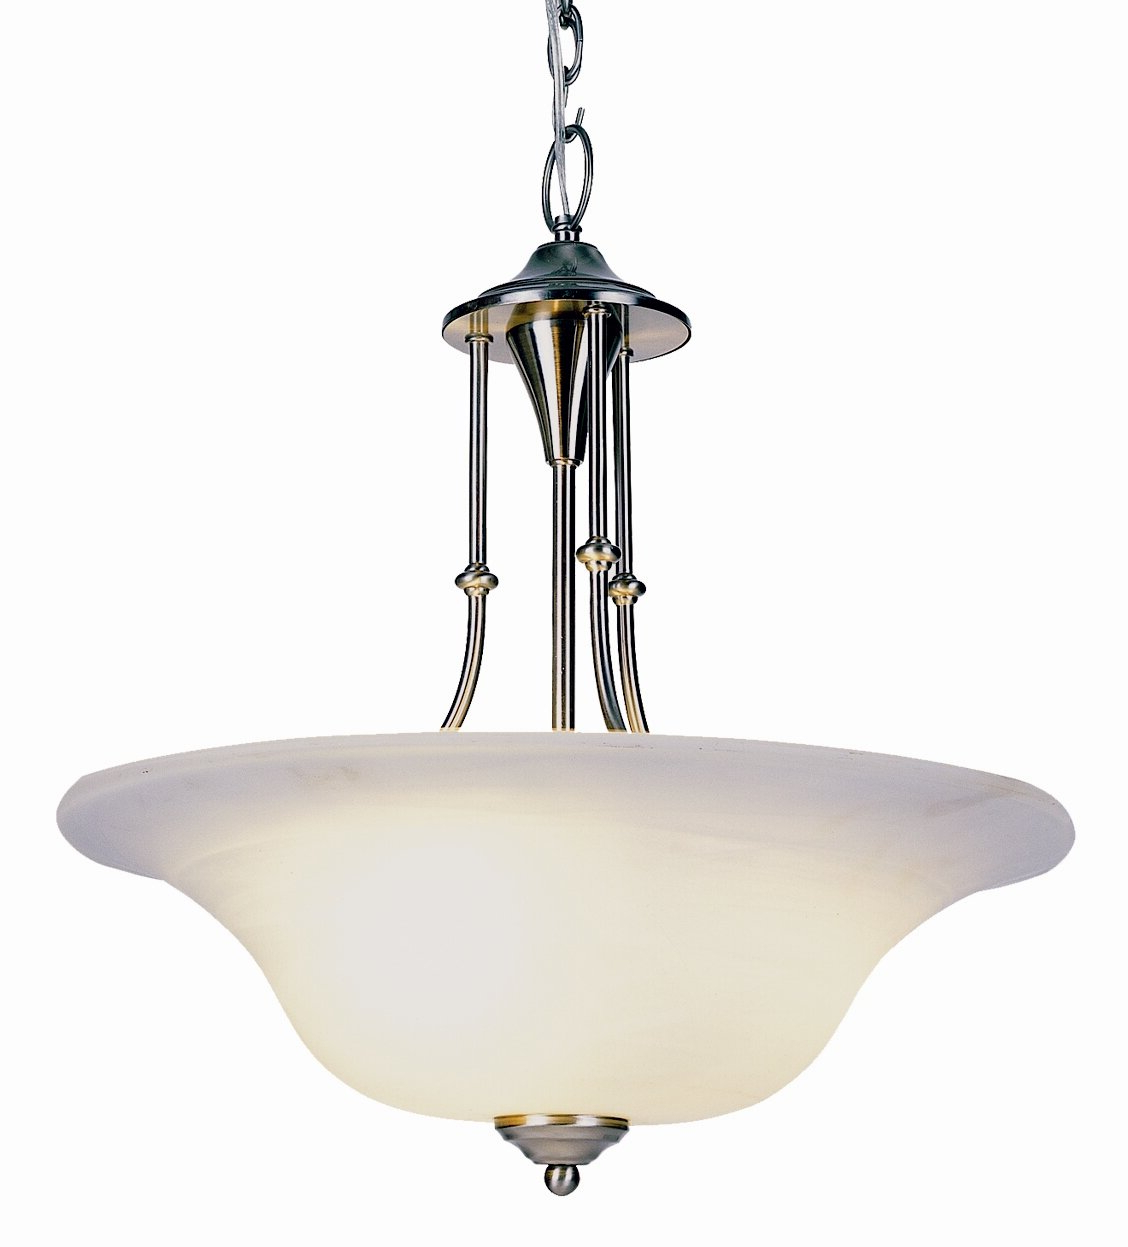 Newent 3-Light Bowl Pendant regarding Latest Newent 3-Light Single Bowl Pendants